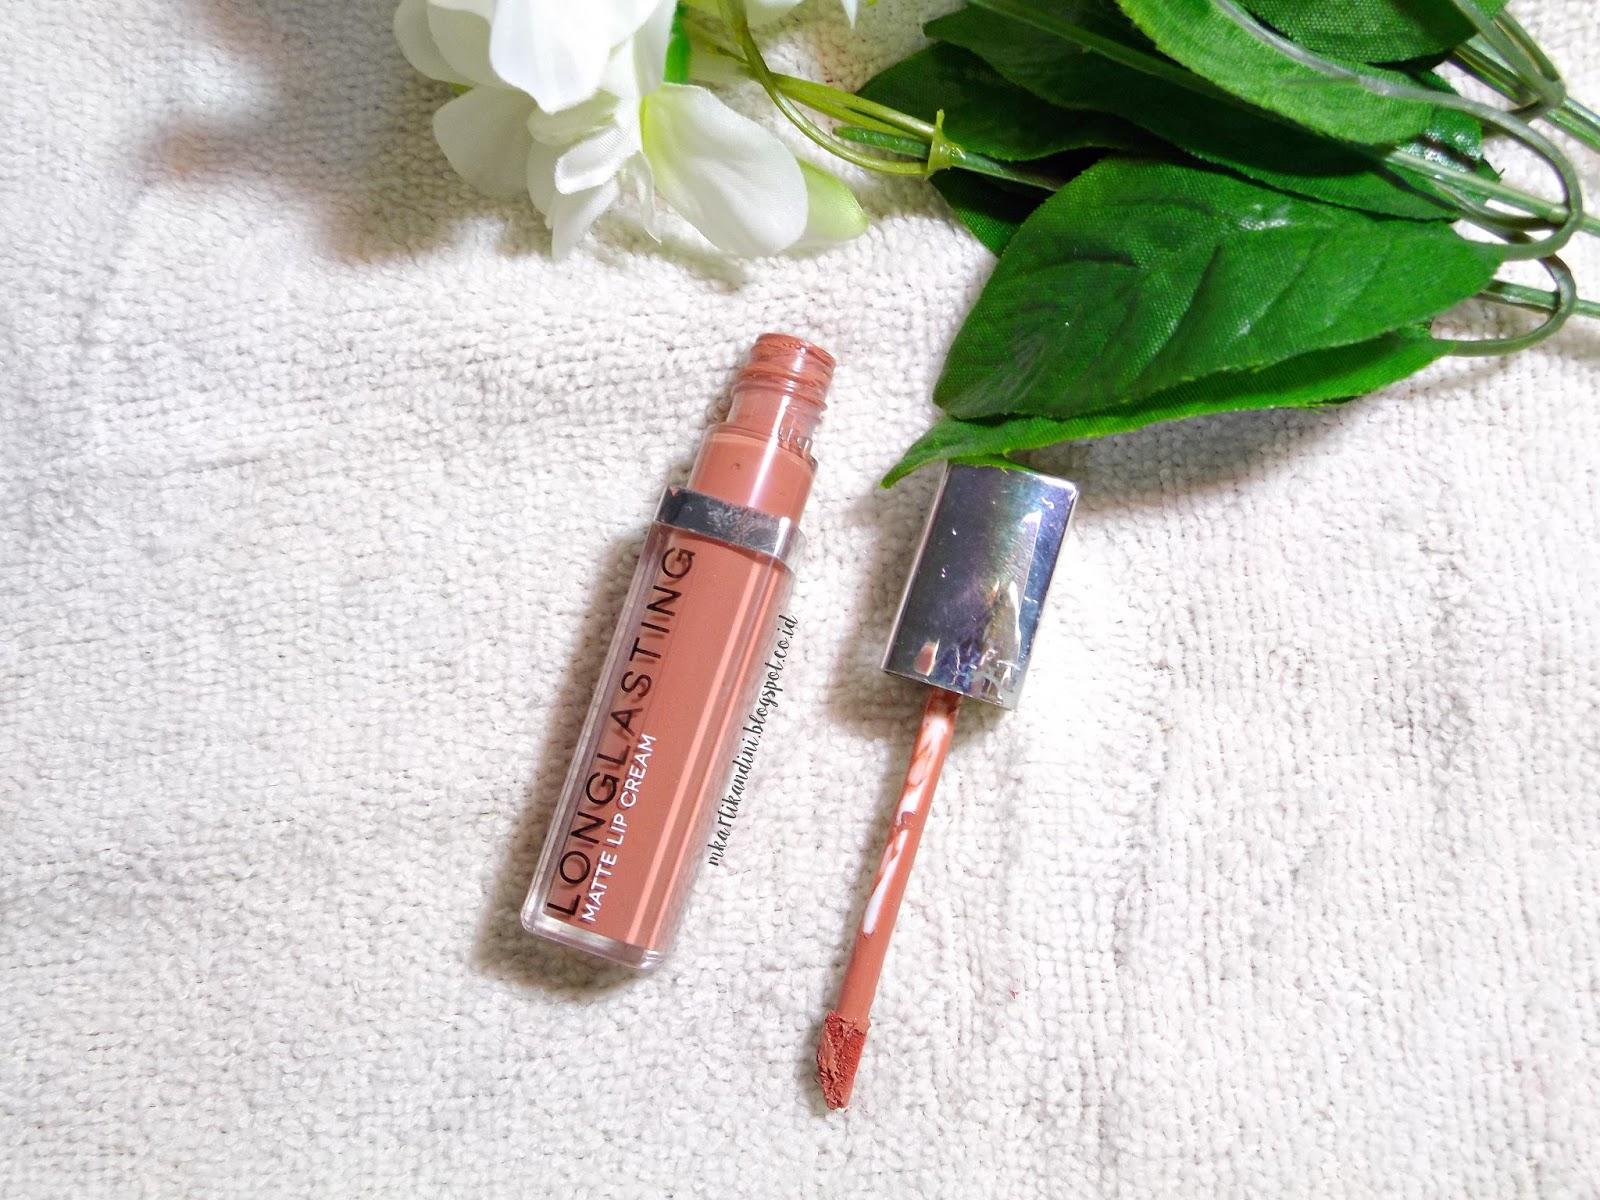 Review Lt Pro Longlasting Matte Lip Cream Tampil Cantik 07 Cilla Lipcream